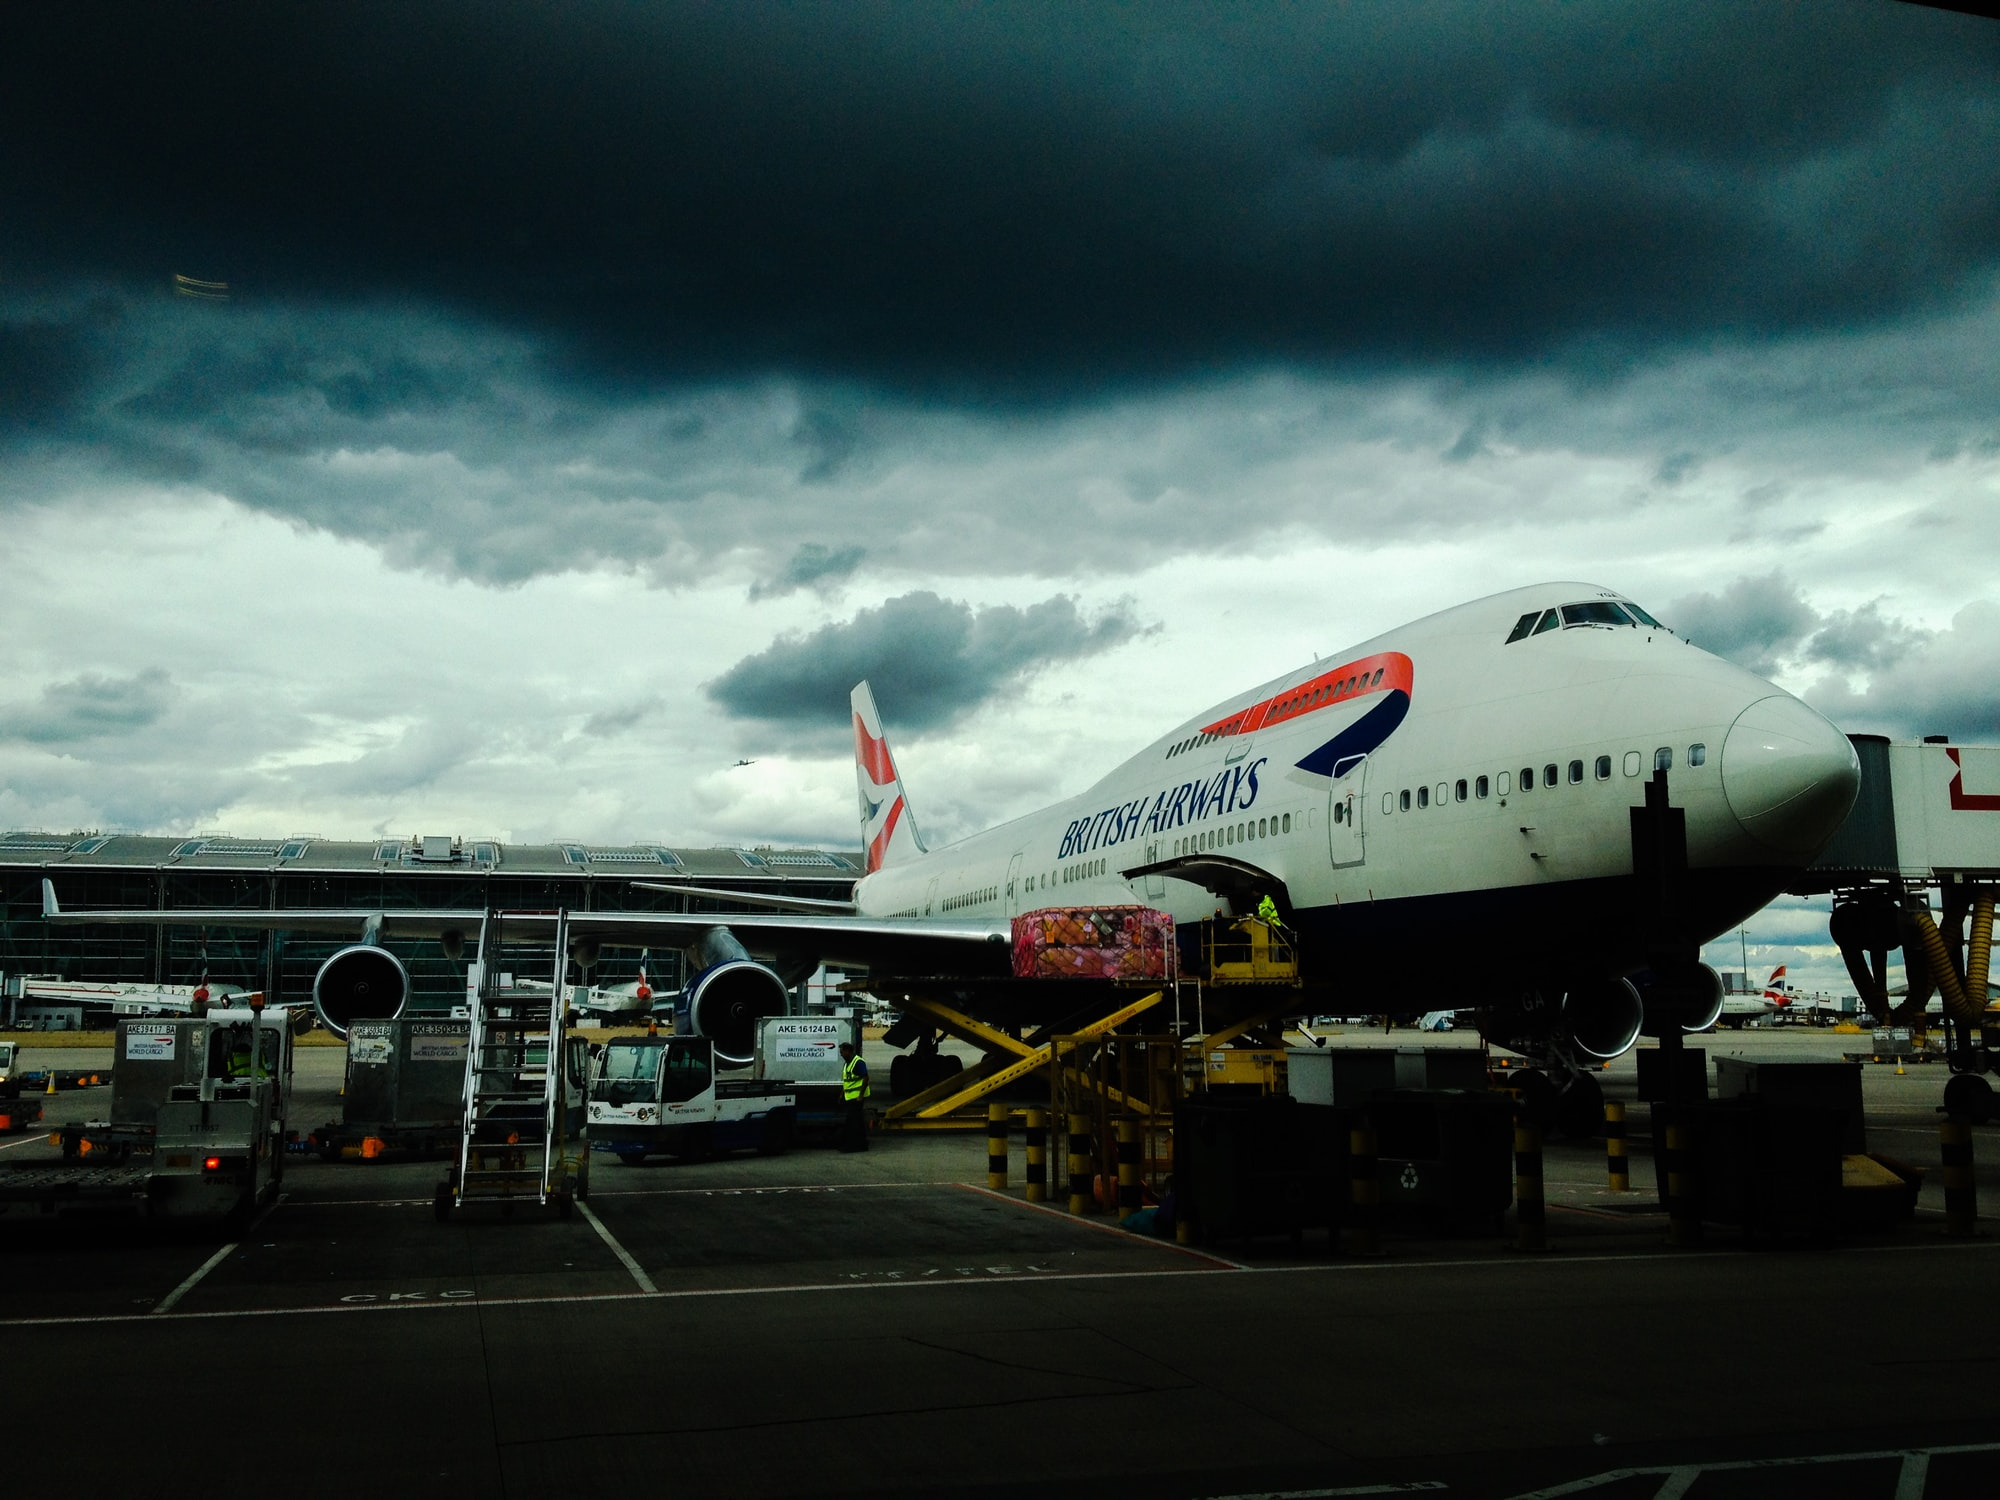 Airplane under dark cloudy skies